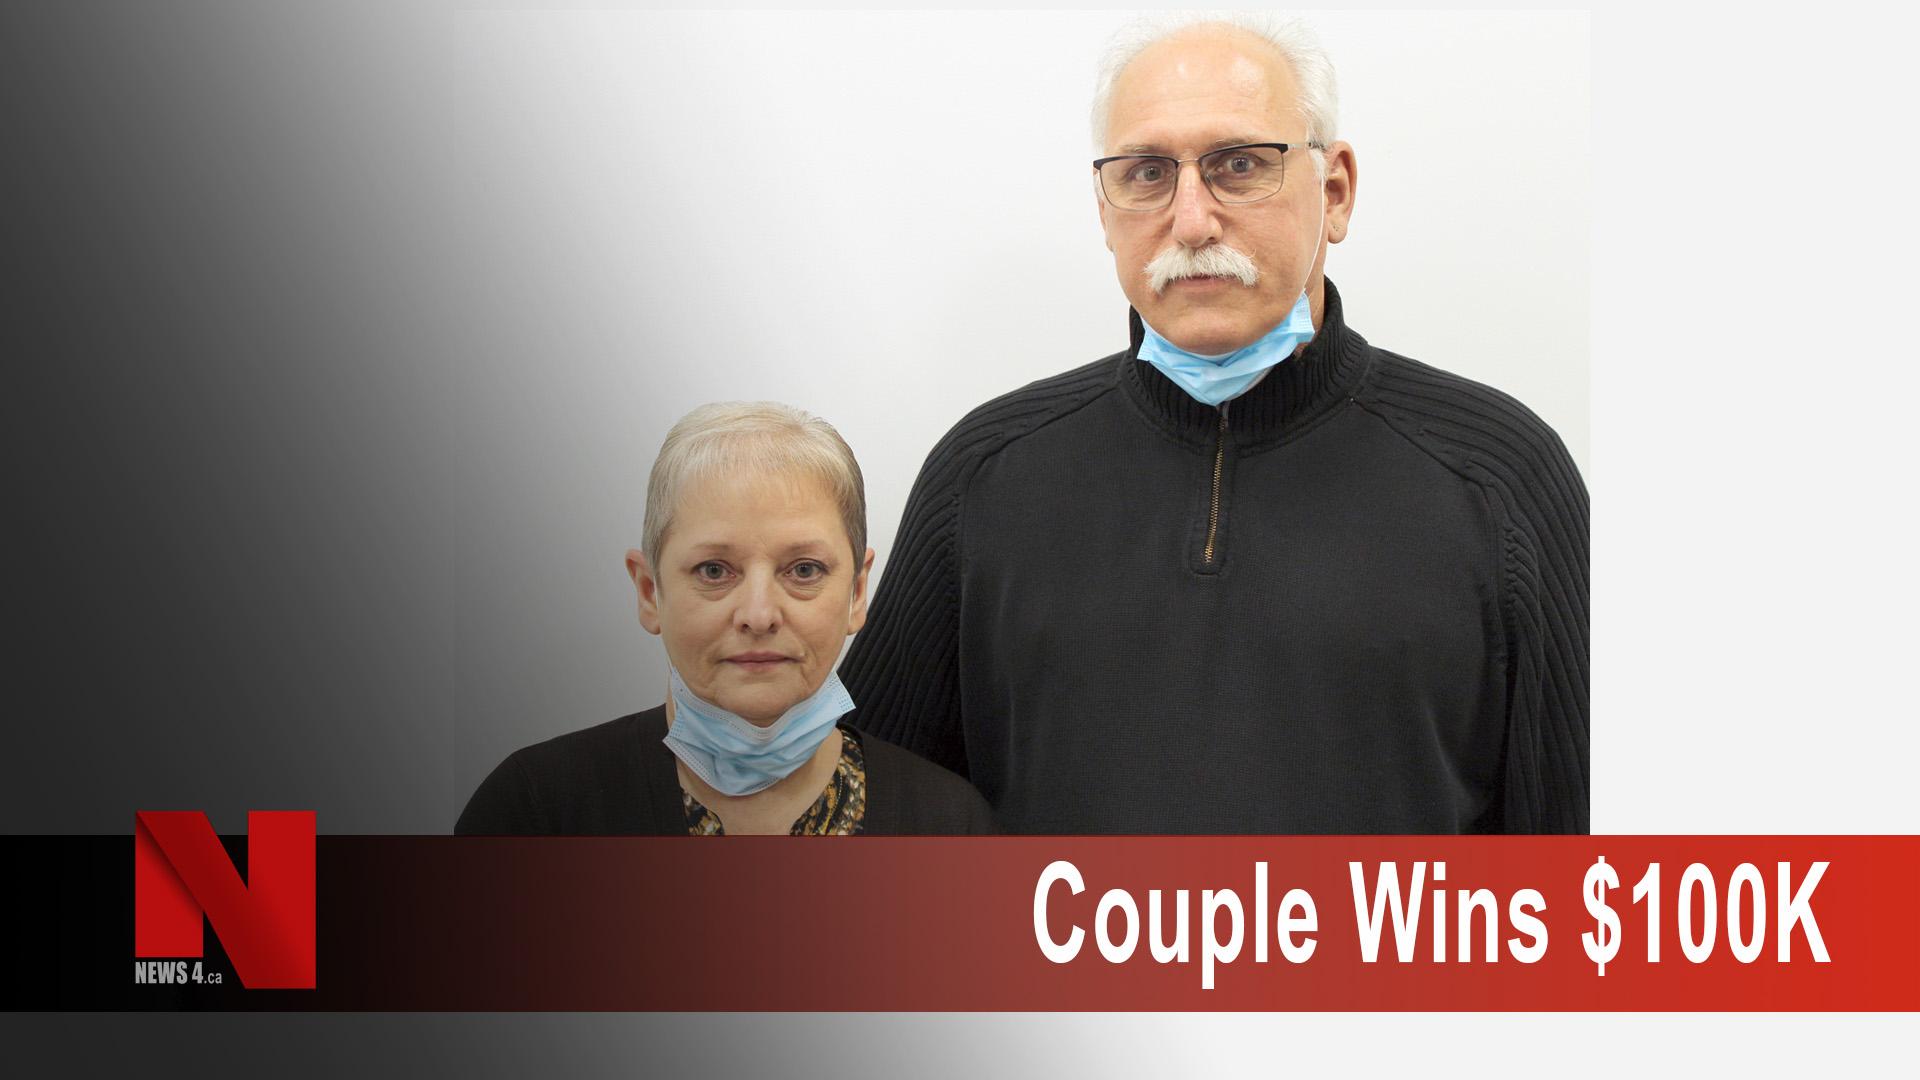 Couple Wins 100K